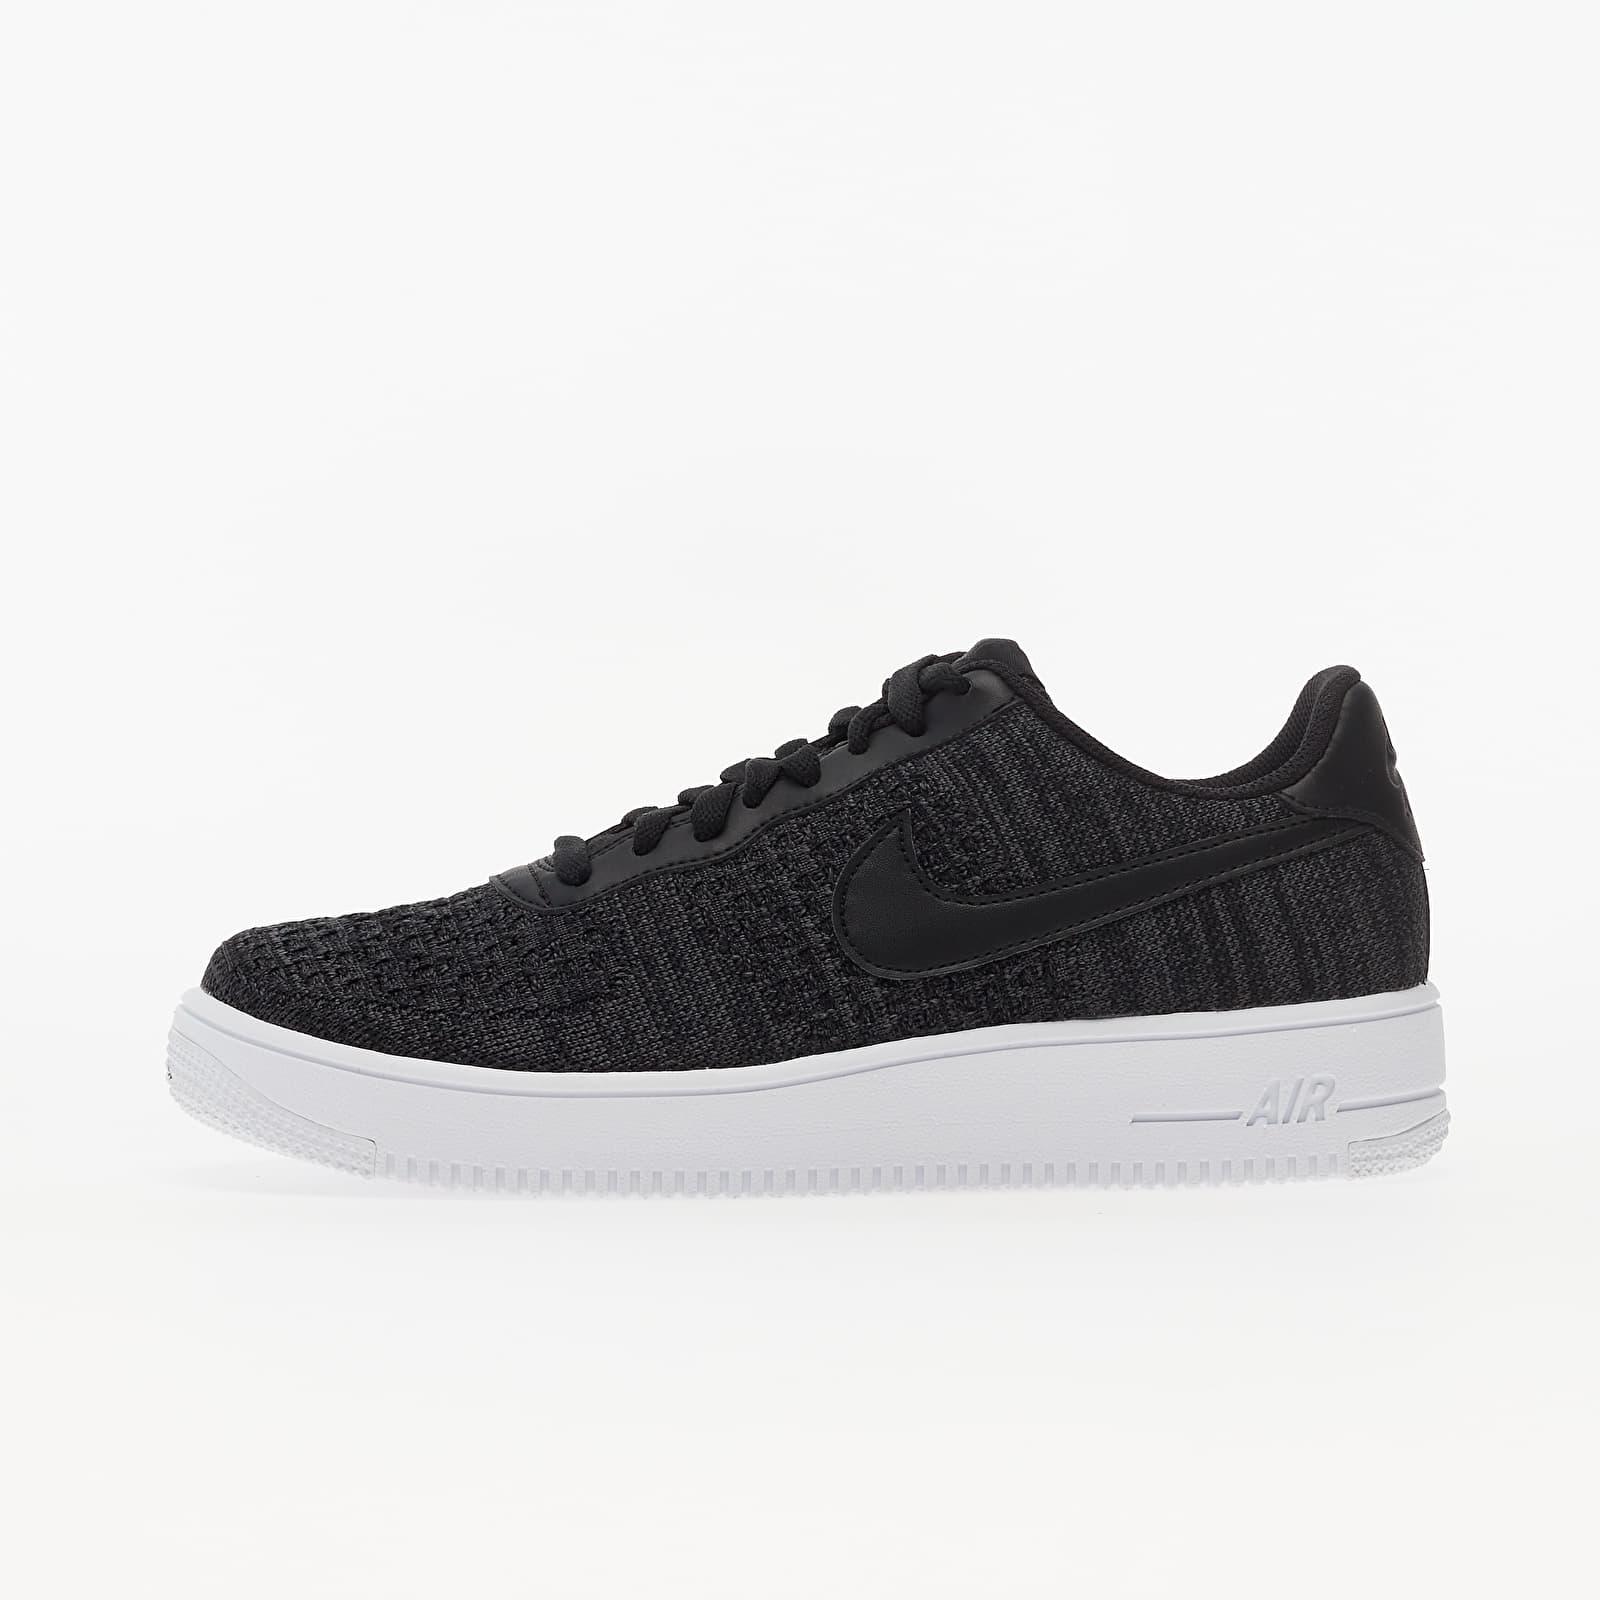 polilla Desaparecido Imbécil  Men's shoes Nike Air Force 1 Flyknit 2.0 Black/ Anthracite-White